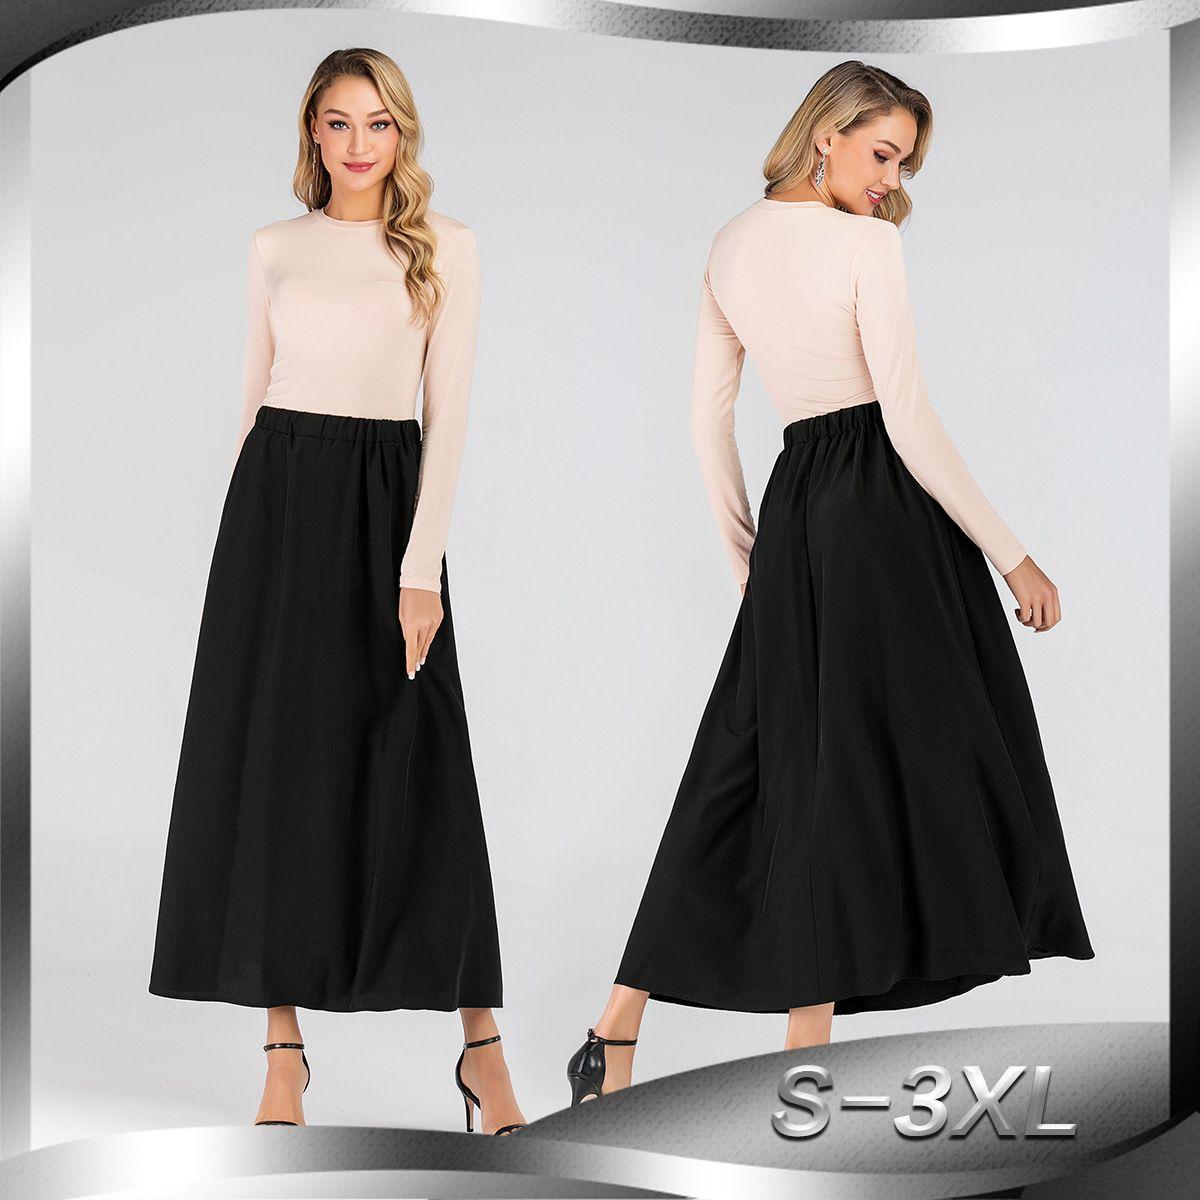 0e318d020 2194 # Mujeres Faldas Largas Elásticas Cintura Alta Maxi Faldas Playa Boho  Vintage Summer Faldas Causal Vestido